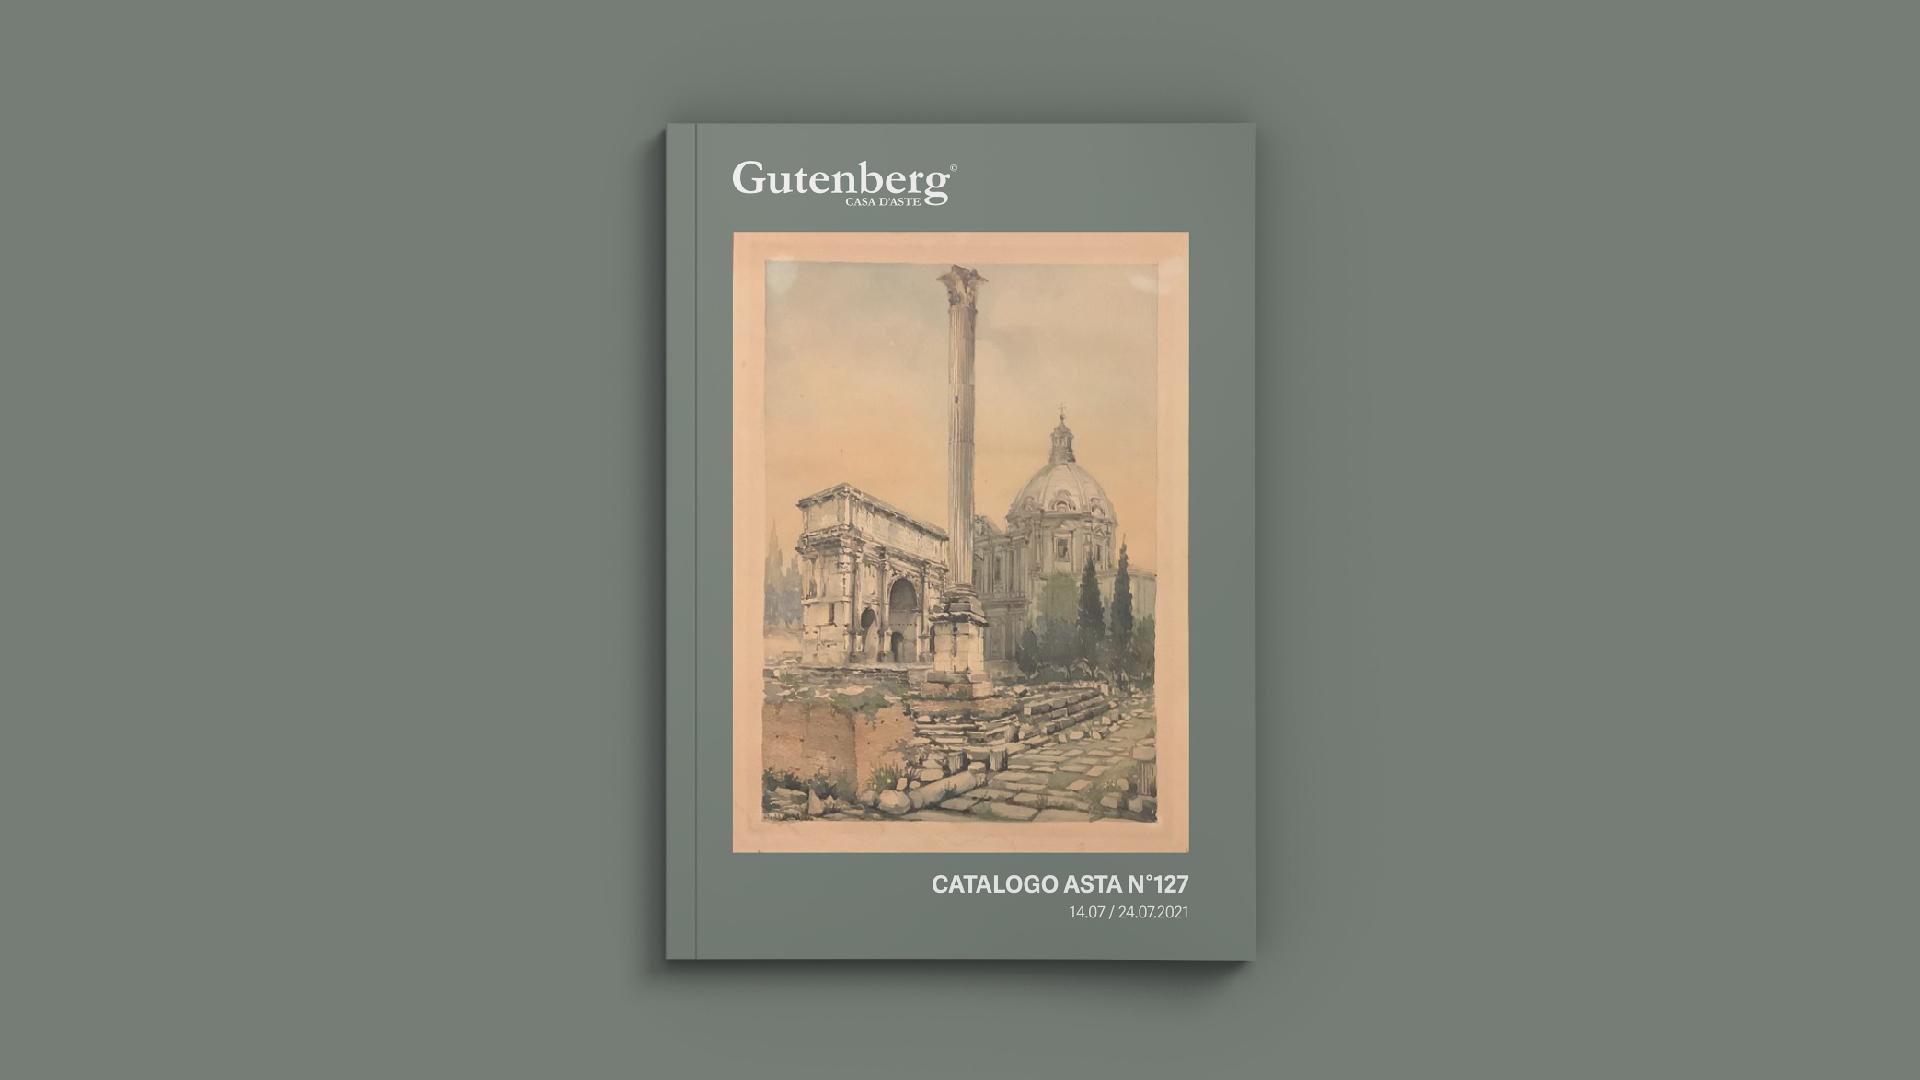 Mockup Catalogo_Gutenberg al Colosseo Casa d'Aste